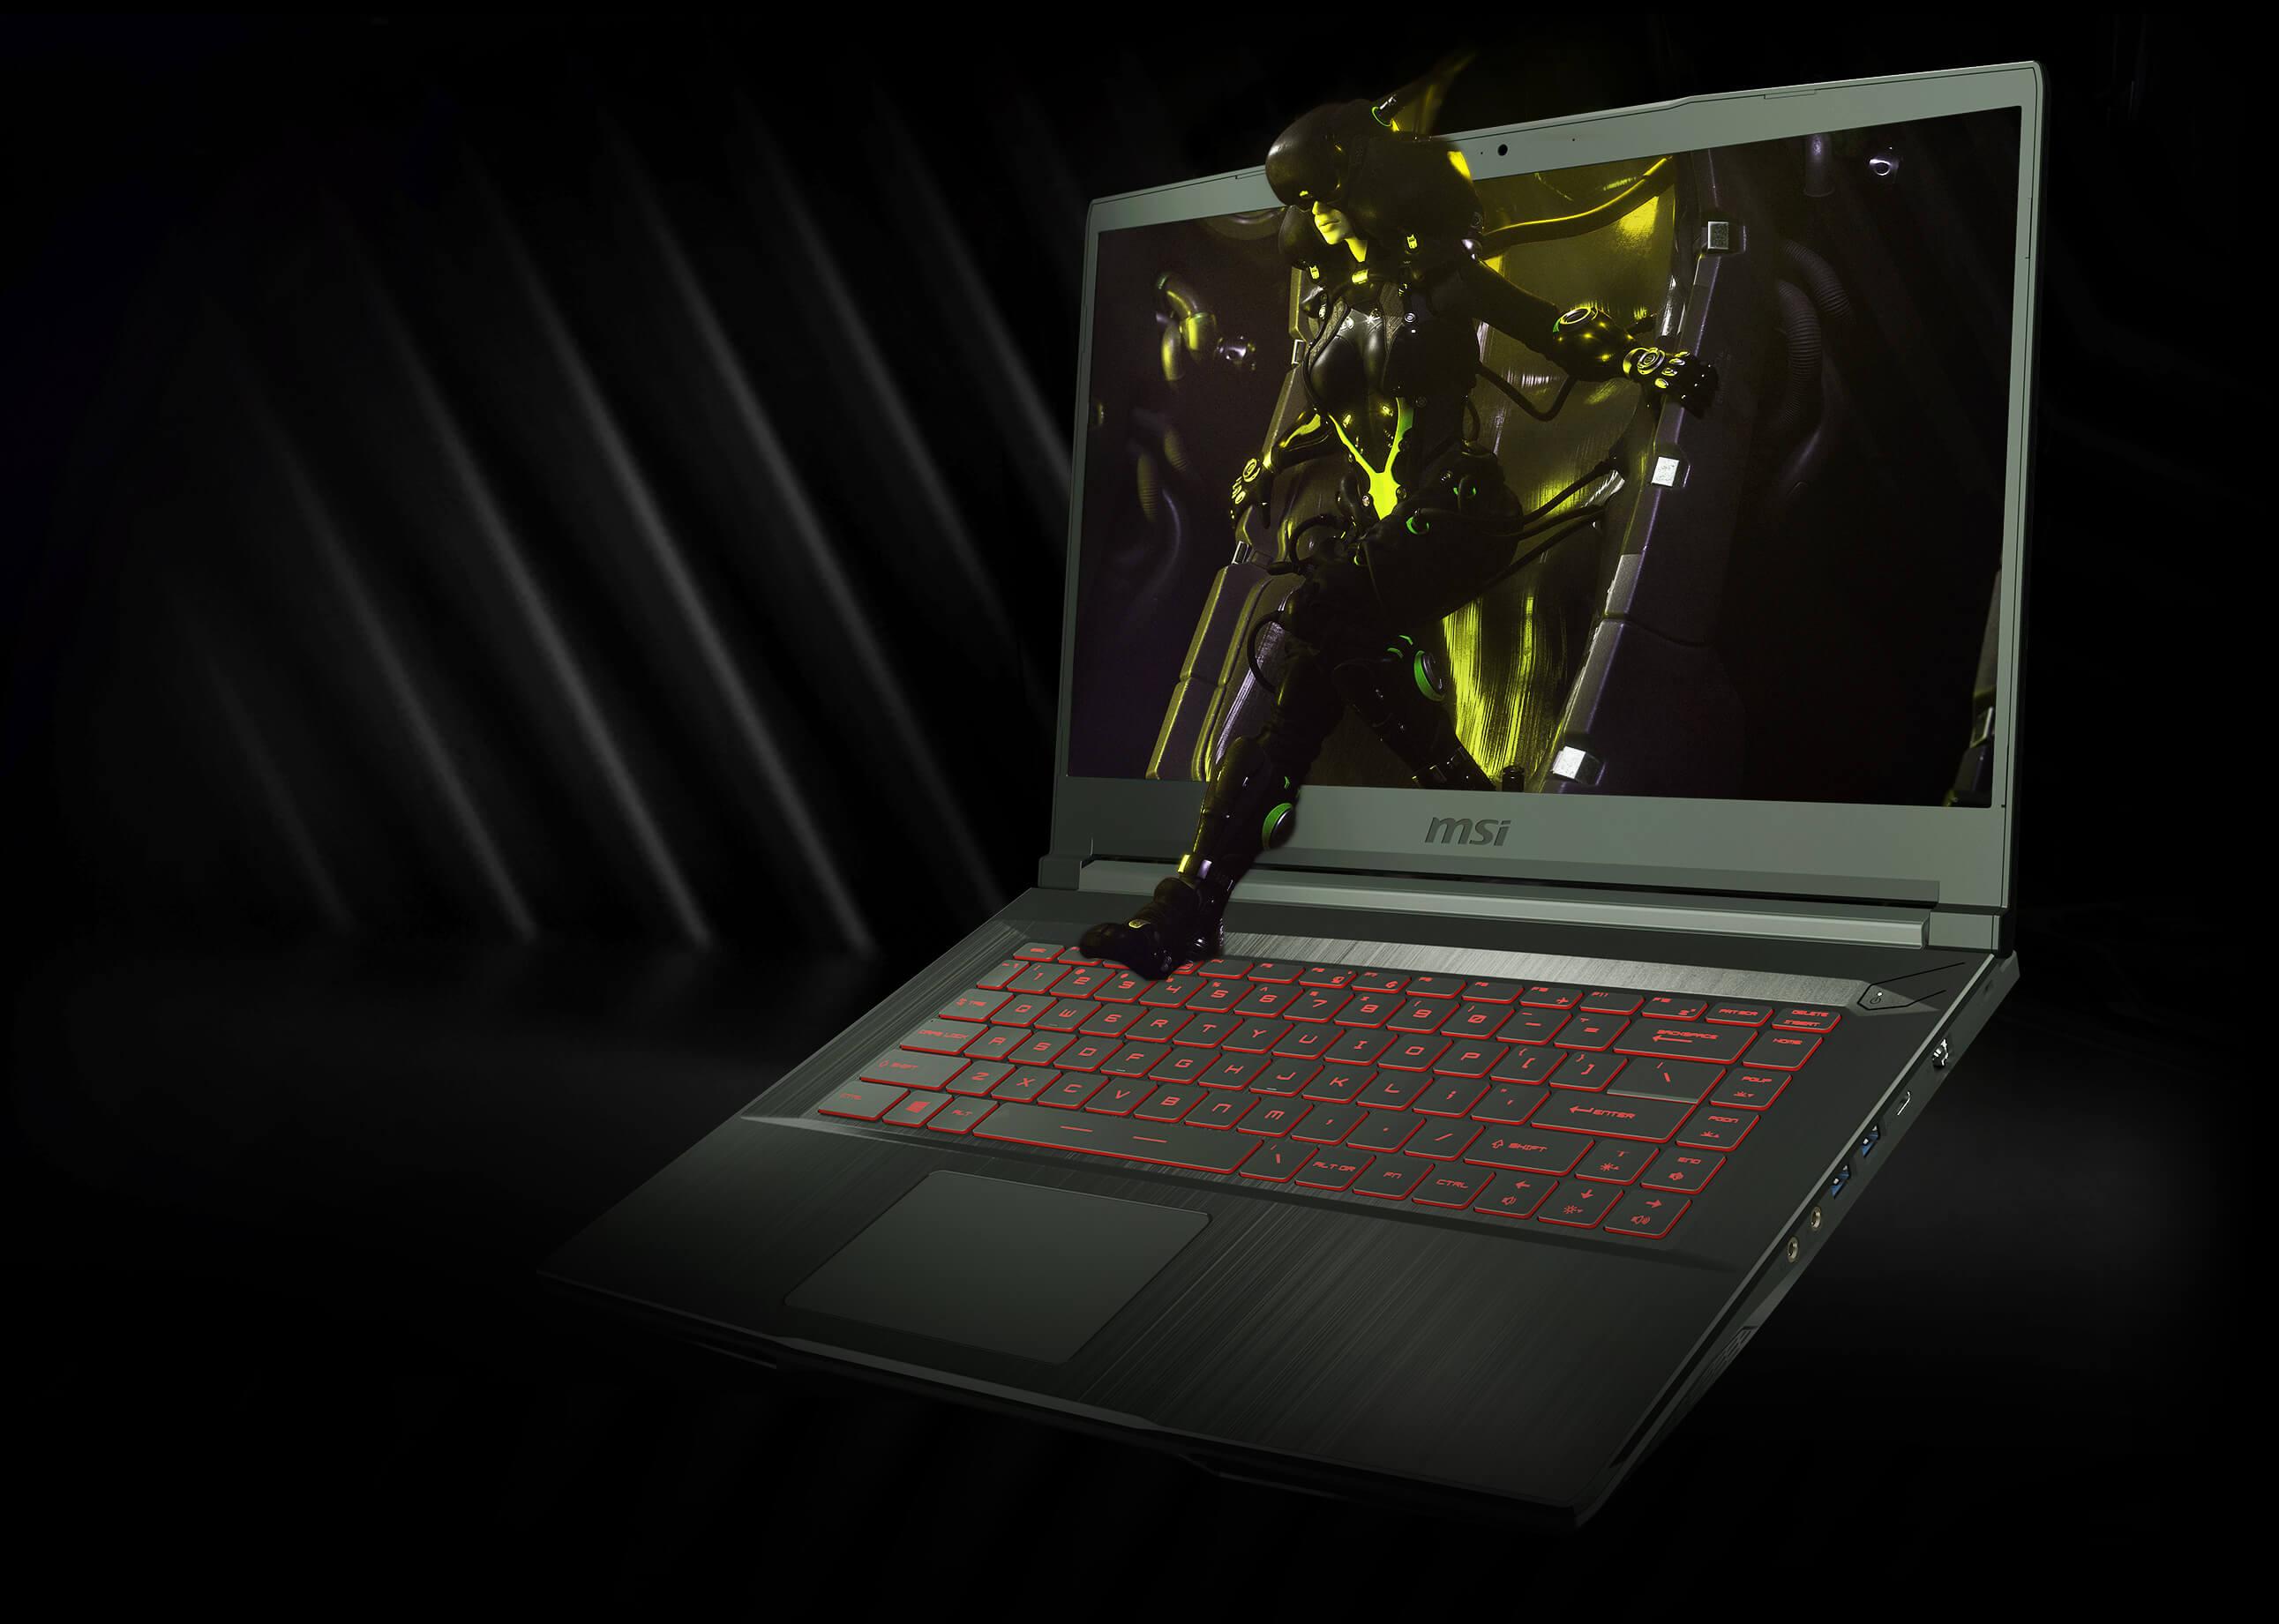 【618】MSI微星 GF63 Thin 10SCXR-282TW 窄邊電競筆電-筆記型電腦專館 - EcLife良興購物網